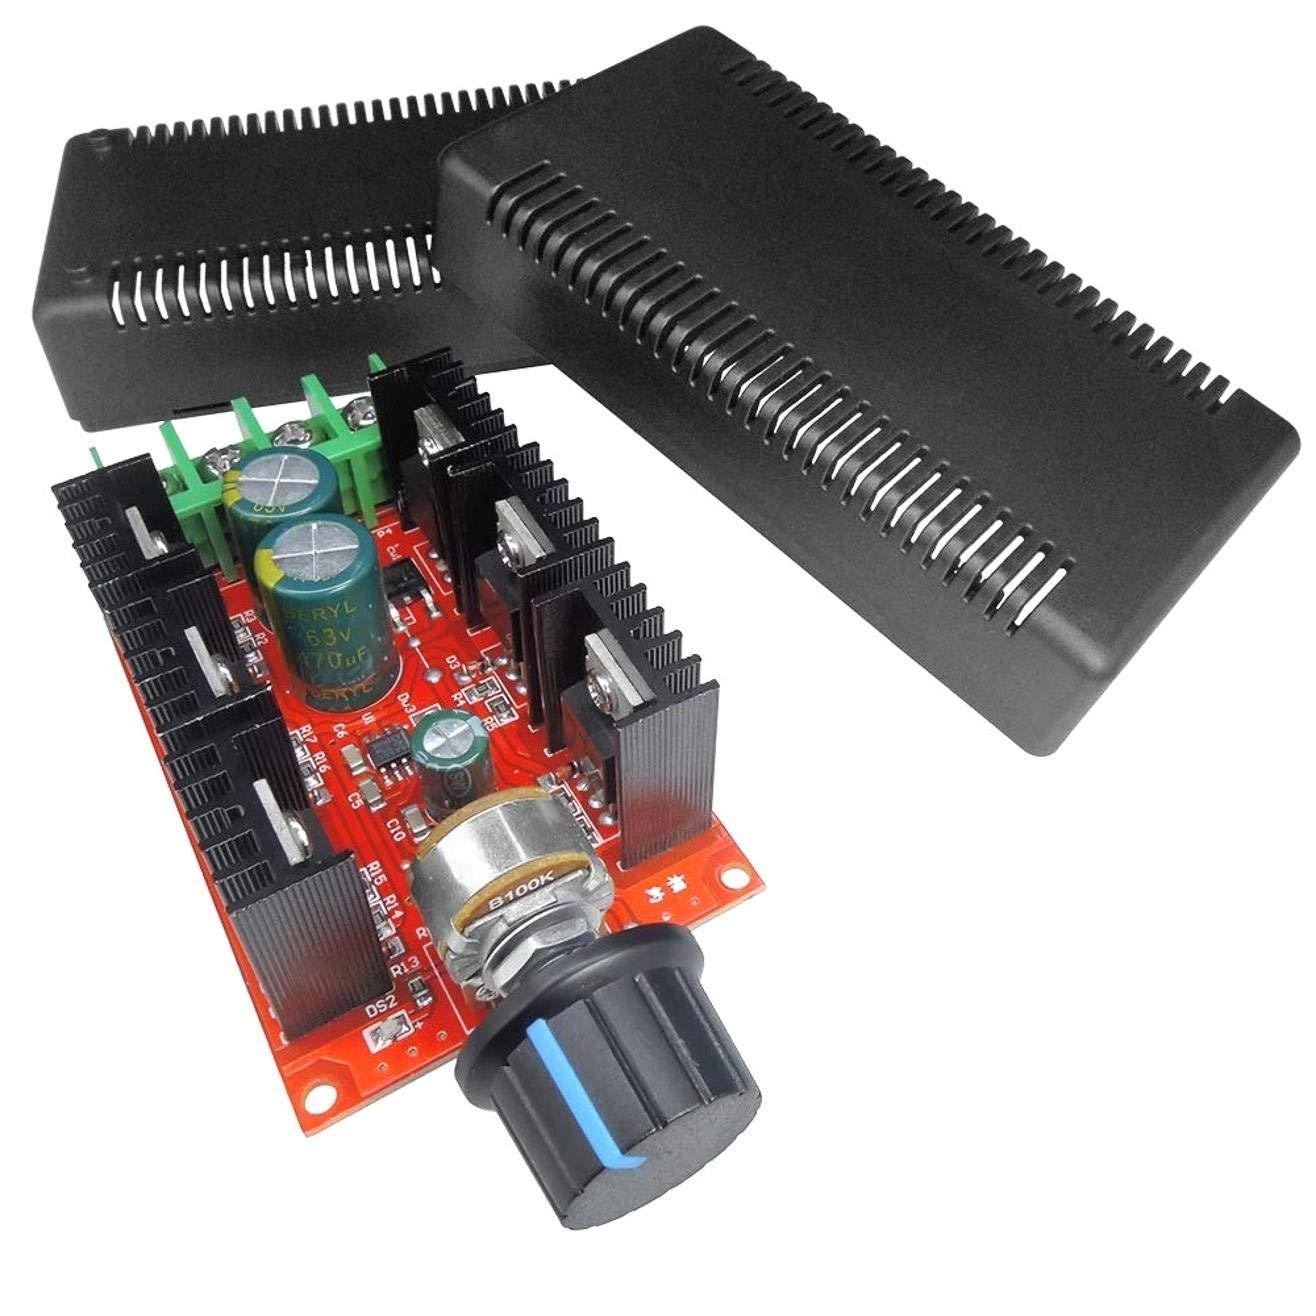 DULALA Motor Drehzahlregelung PWM HHO RC Controller 12V 24V 48V 2000W MAX 10-50V 40A DC